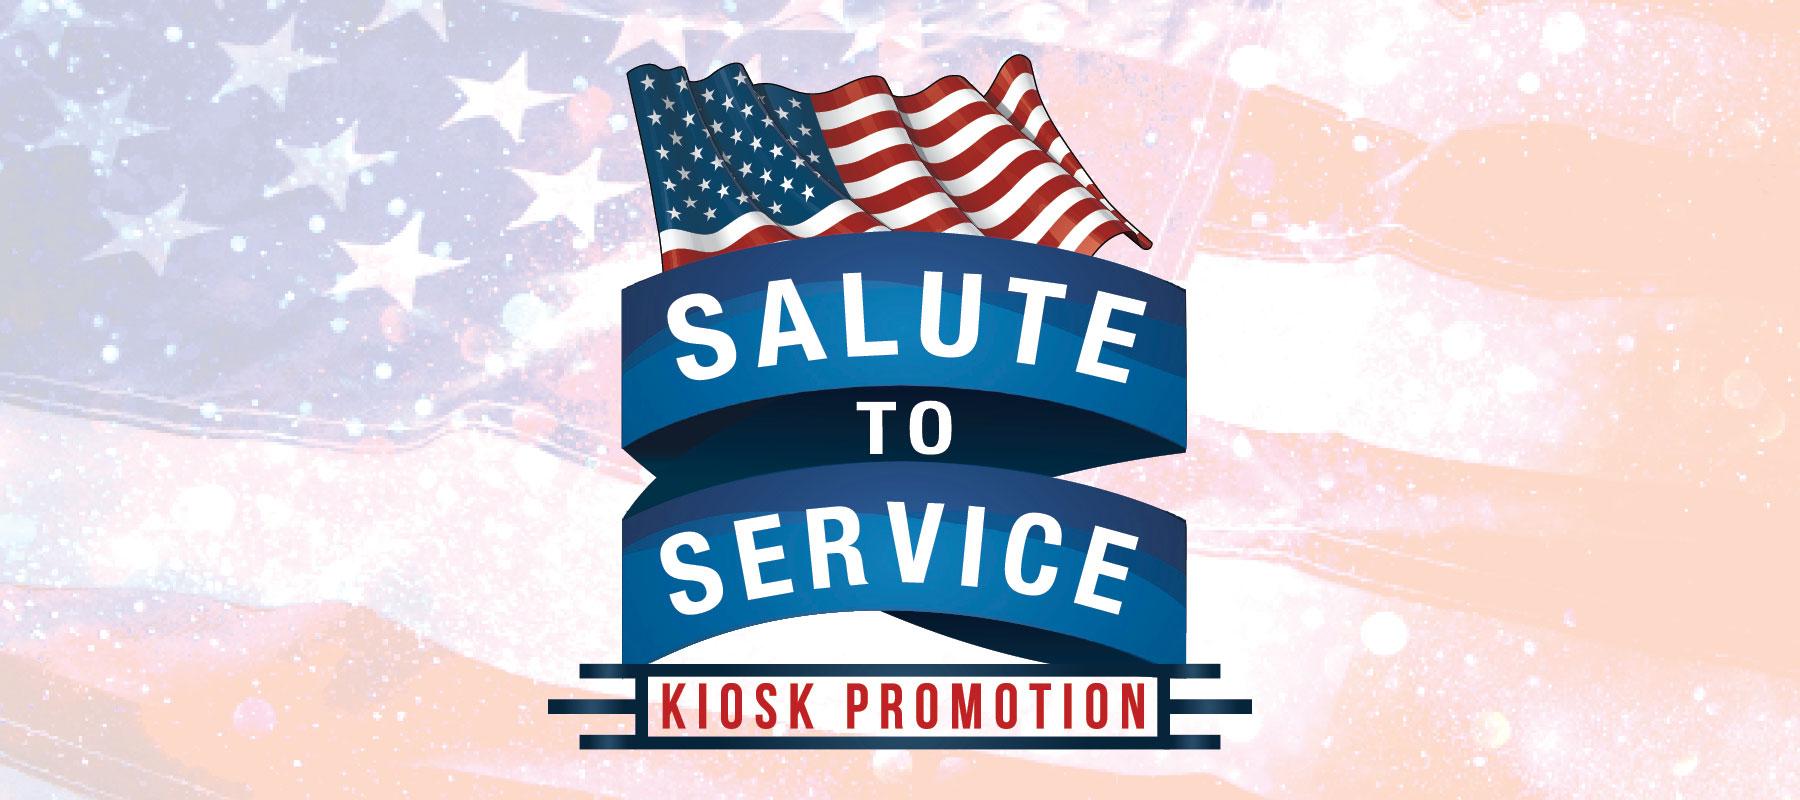 Salute To Service Kiosk Promotion